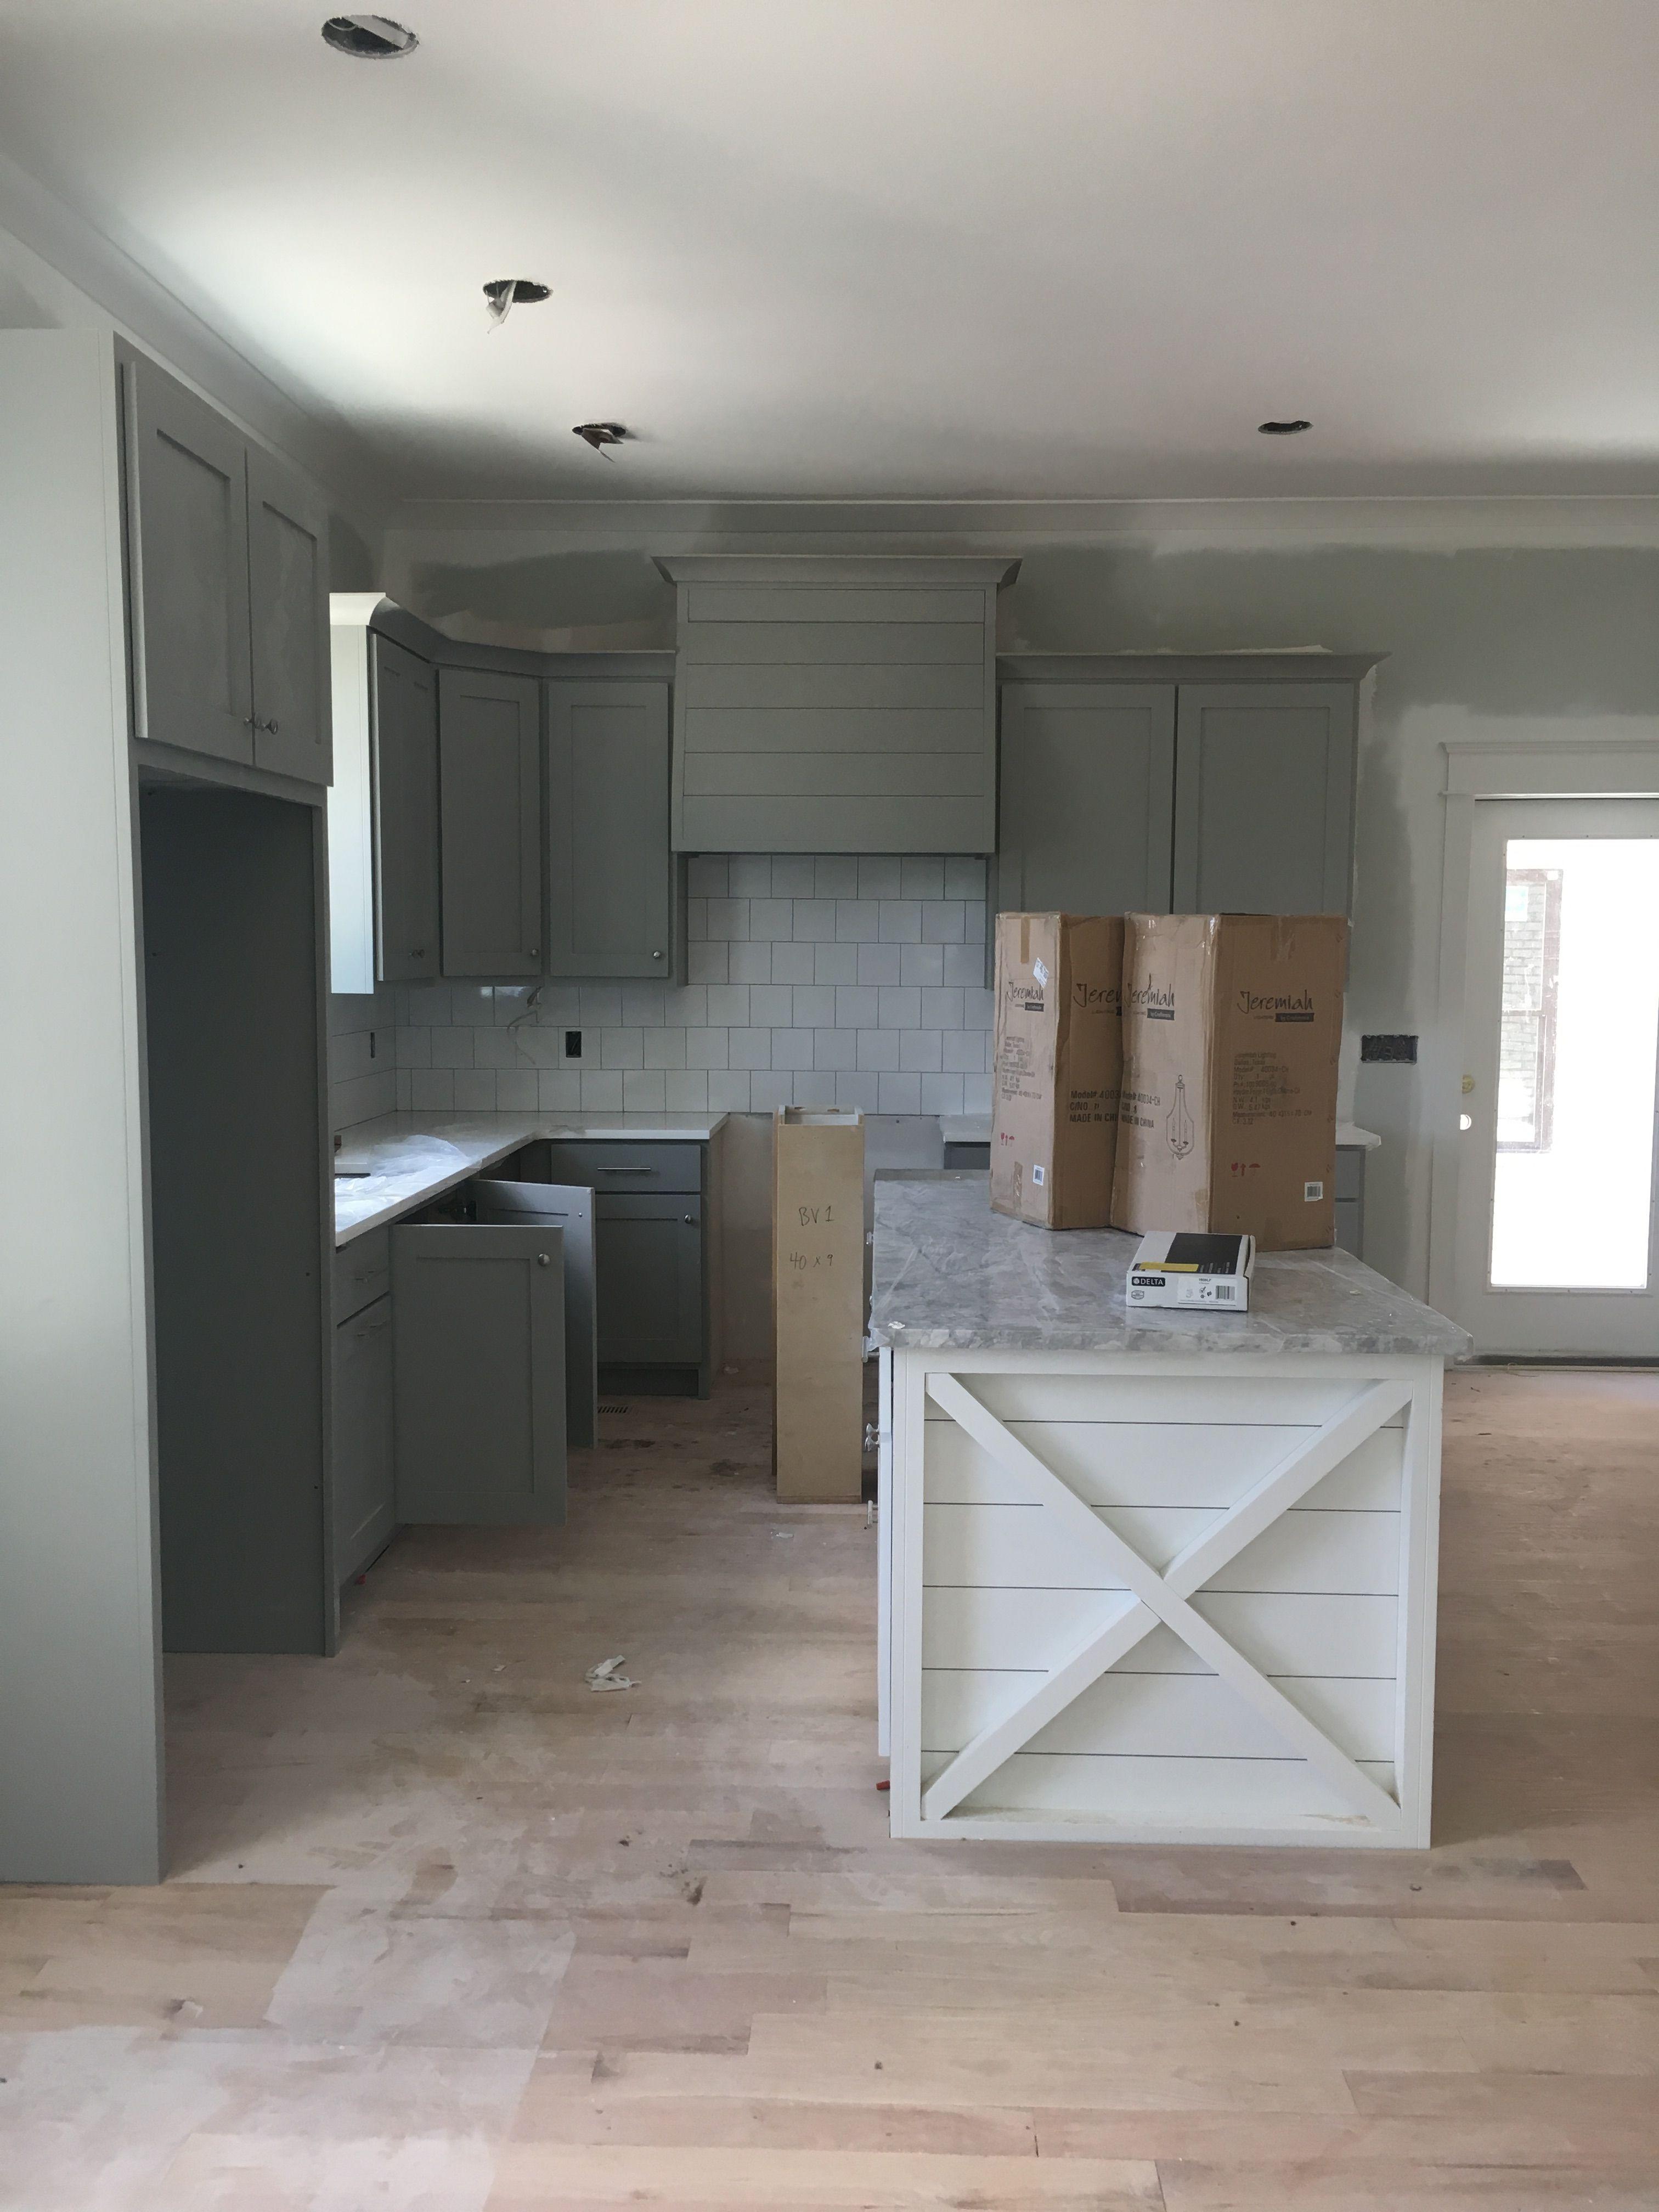 Gray Kitchen Cabinets White Shiplap Island Modern Farmhouse Kitchen Square Backsplash Grey Kitchen Cabinets Grey Kitchen Walls Kitchen Cabinet Design